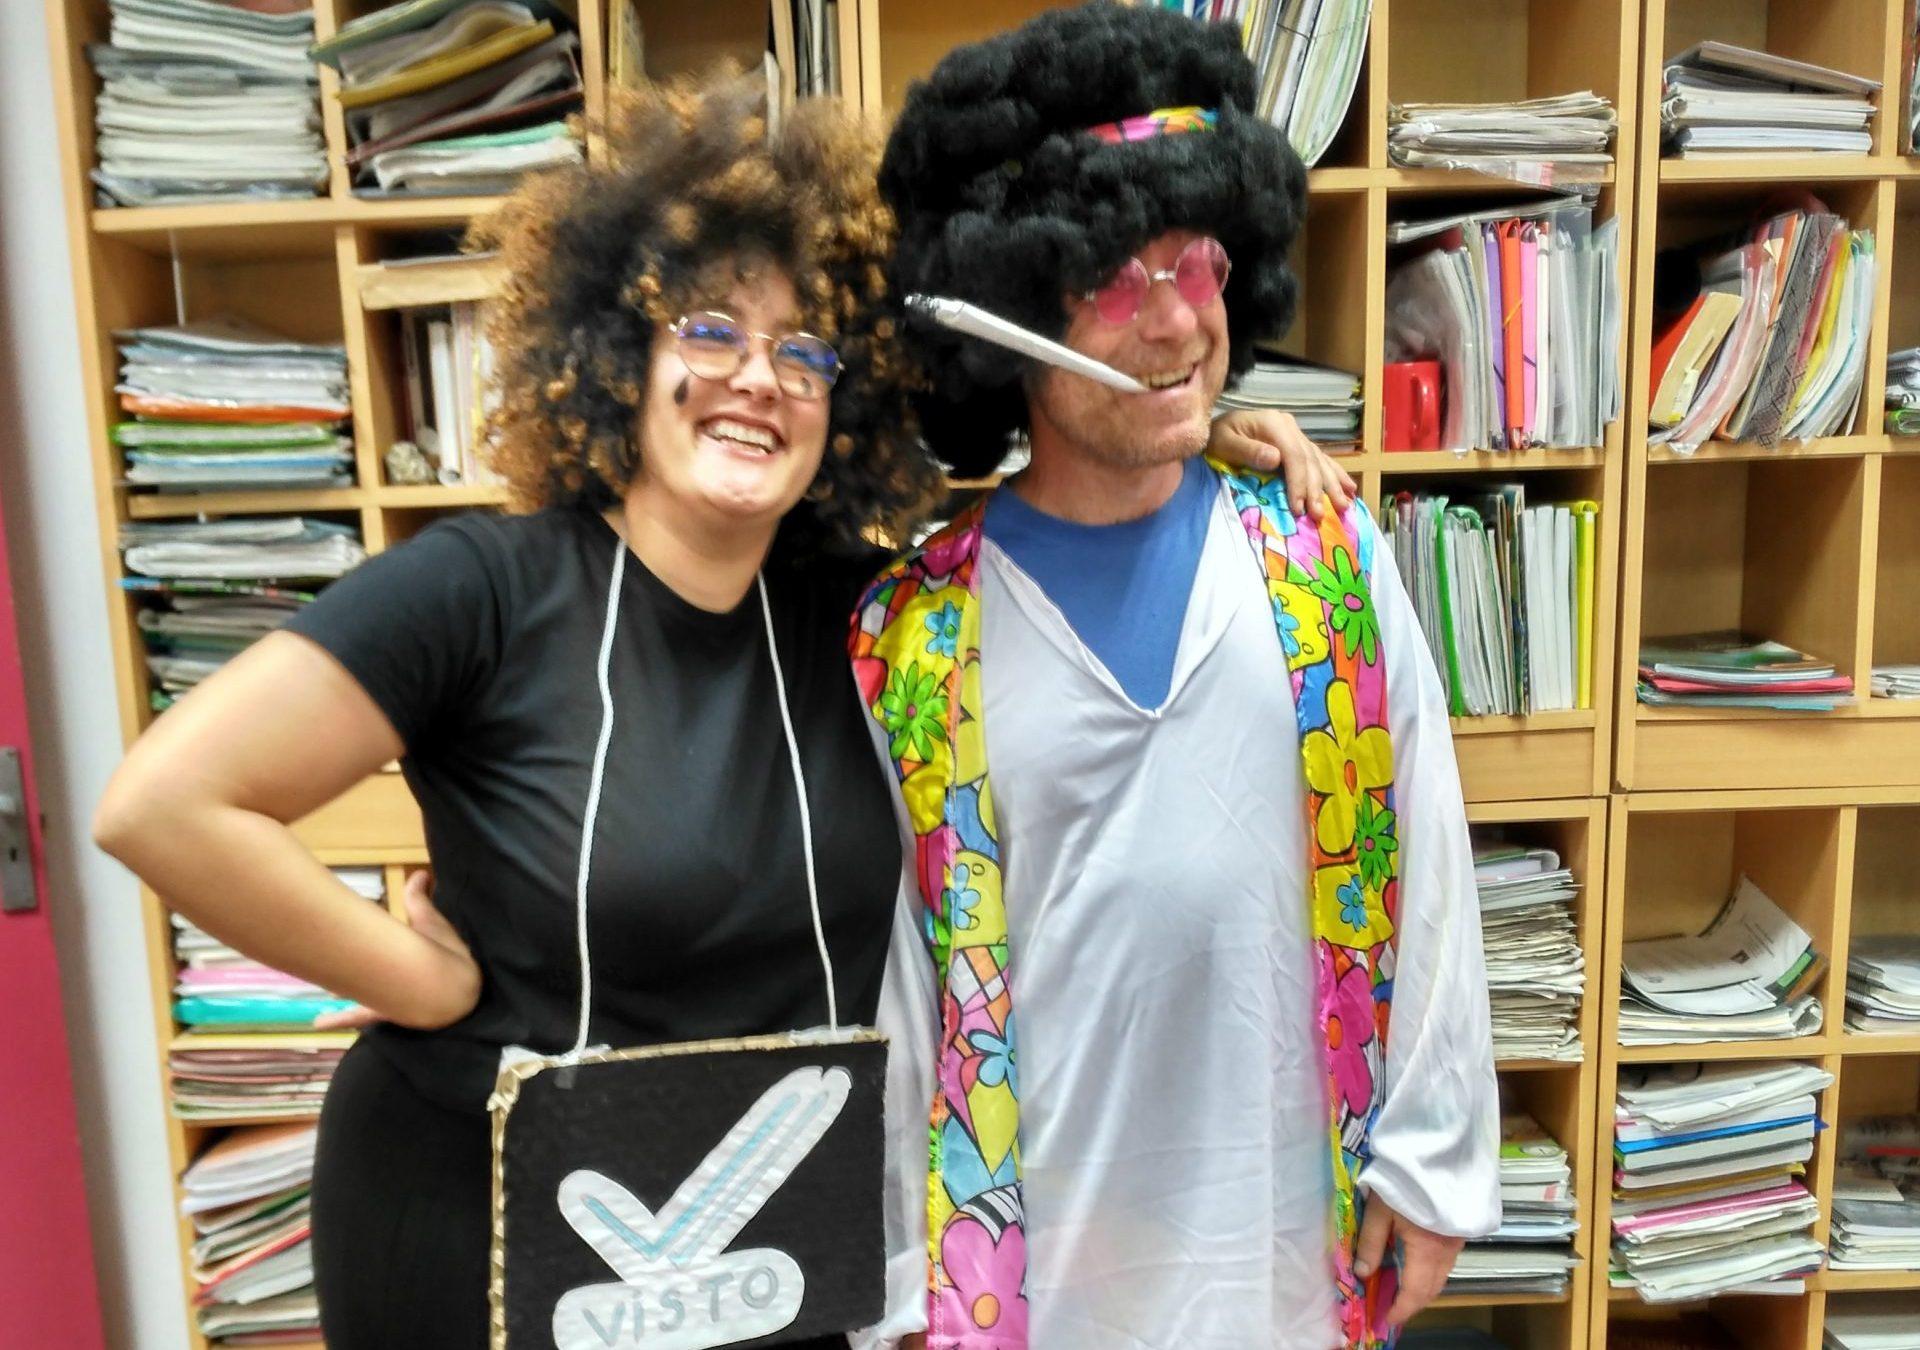 Qui son aquests dos hippies?